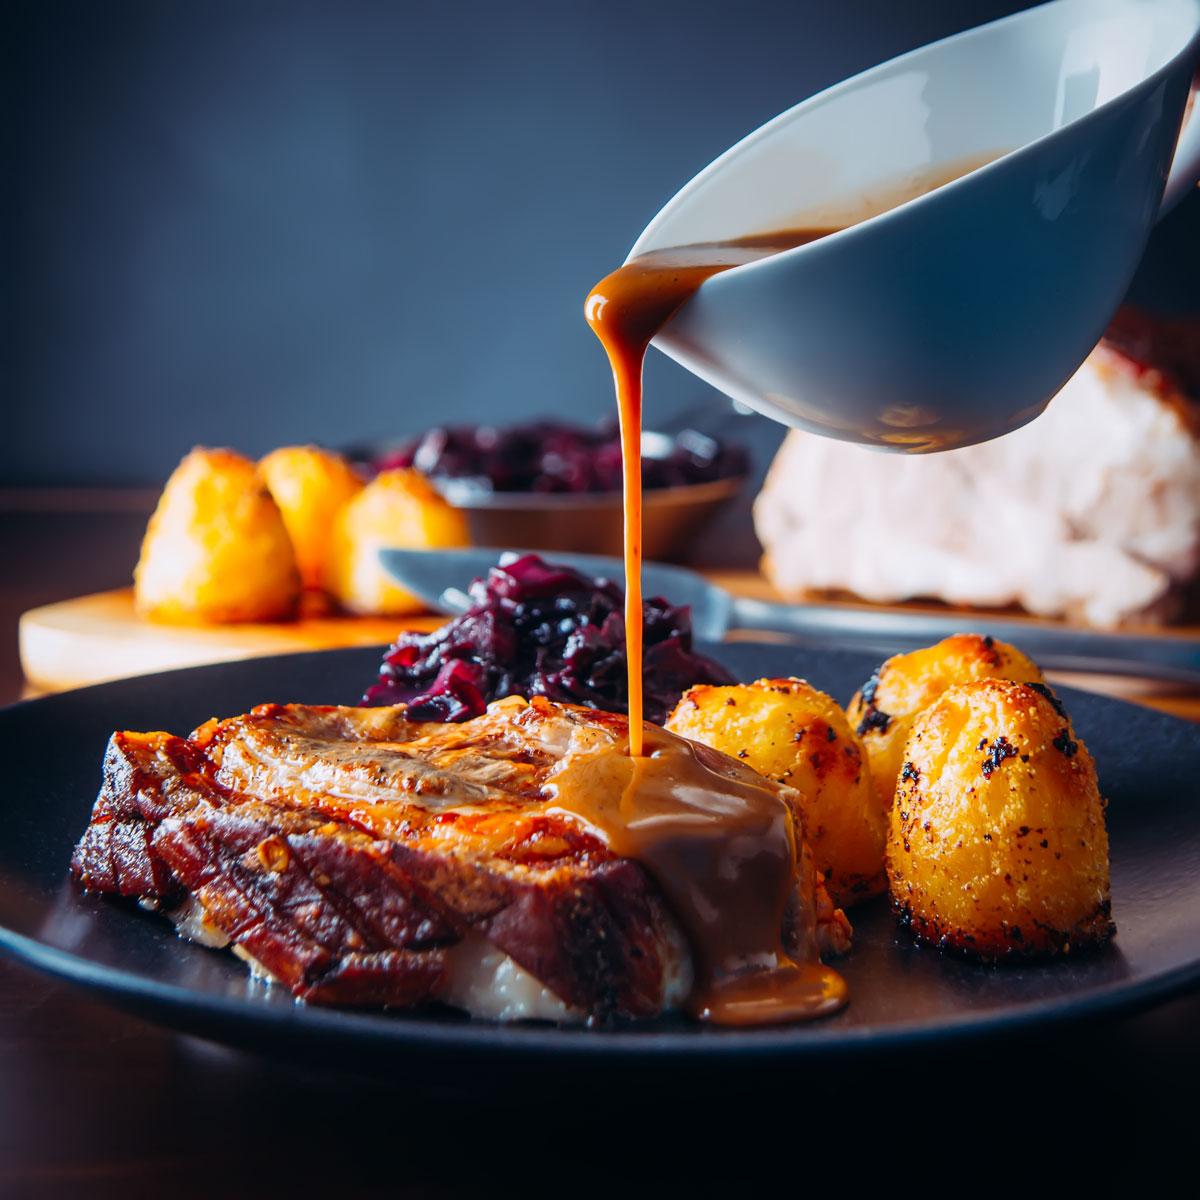 Crispy Roast Pork Belly With Red Cabbage Krumpli